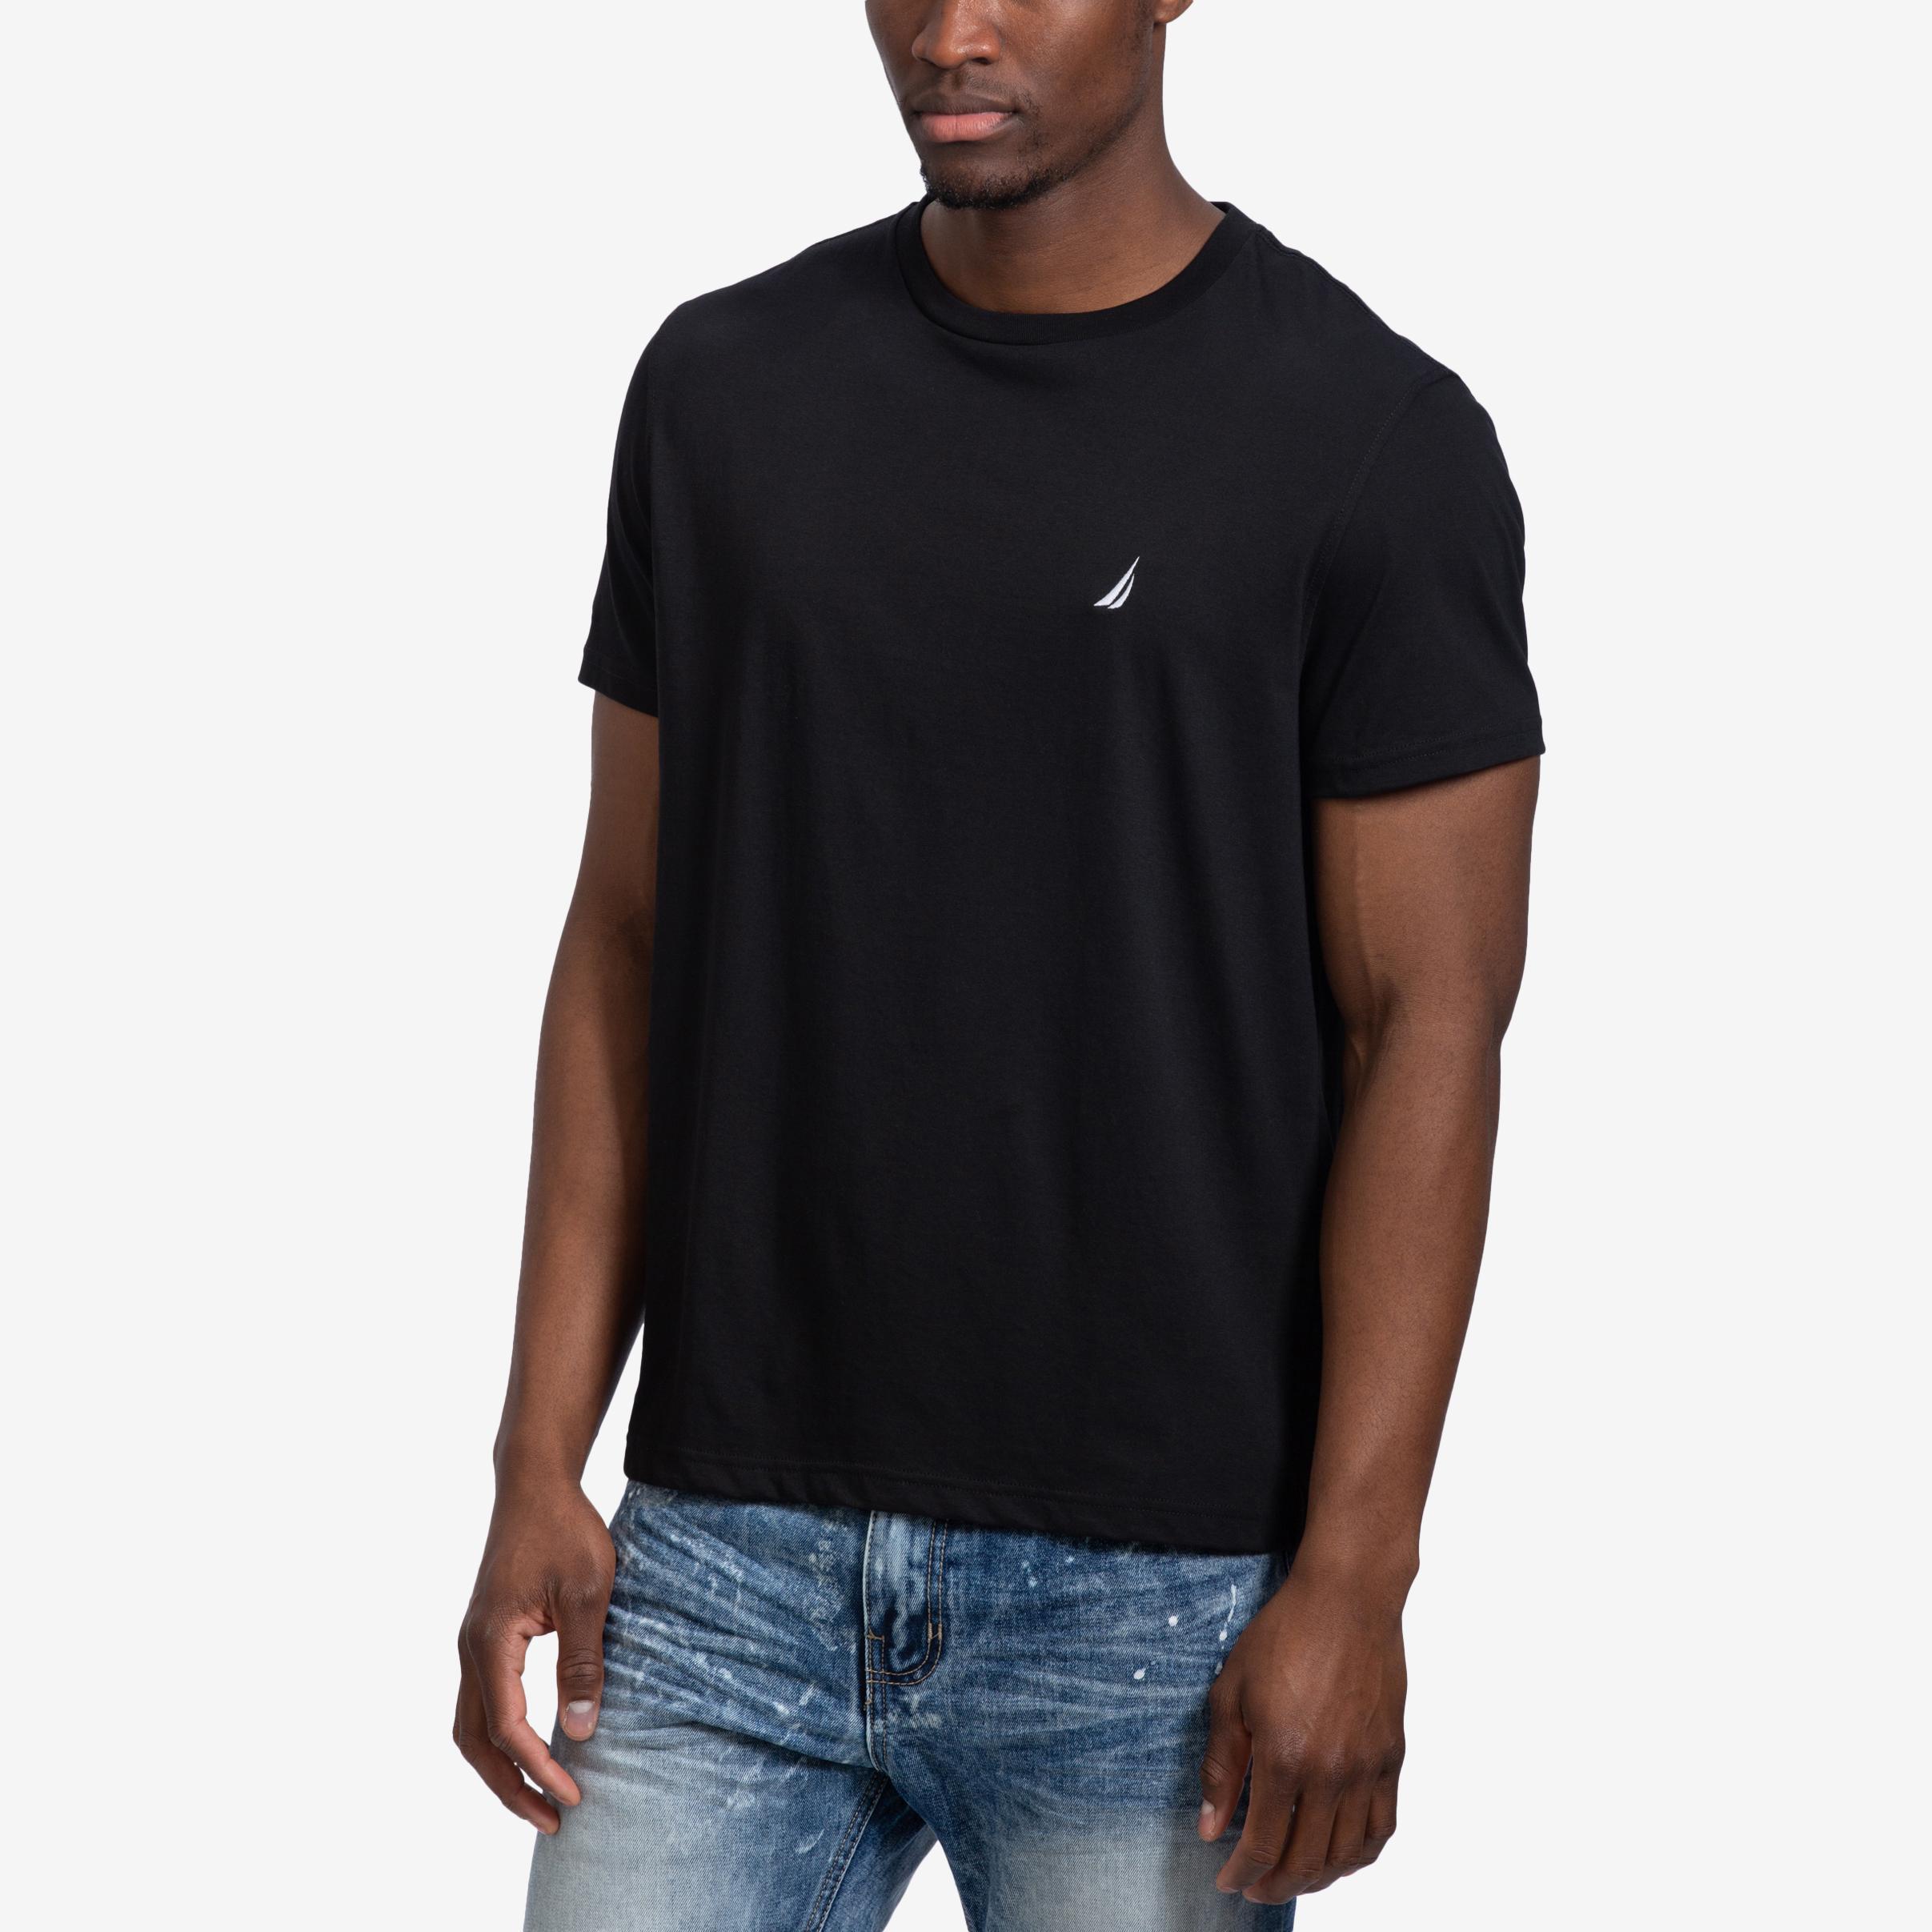 Solid Crew Neck Short Sleeve T- Shirt